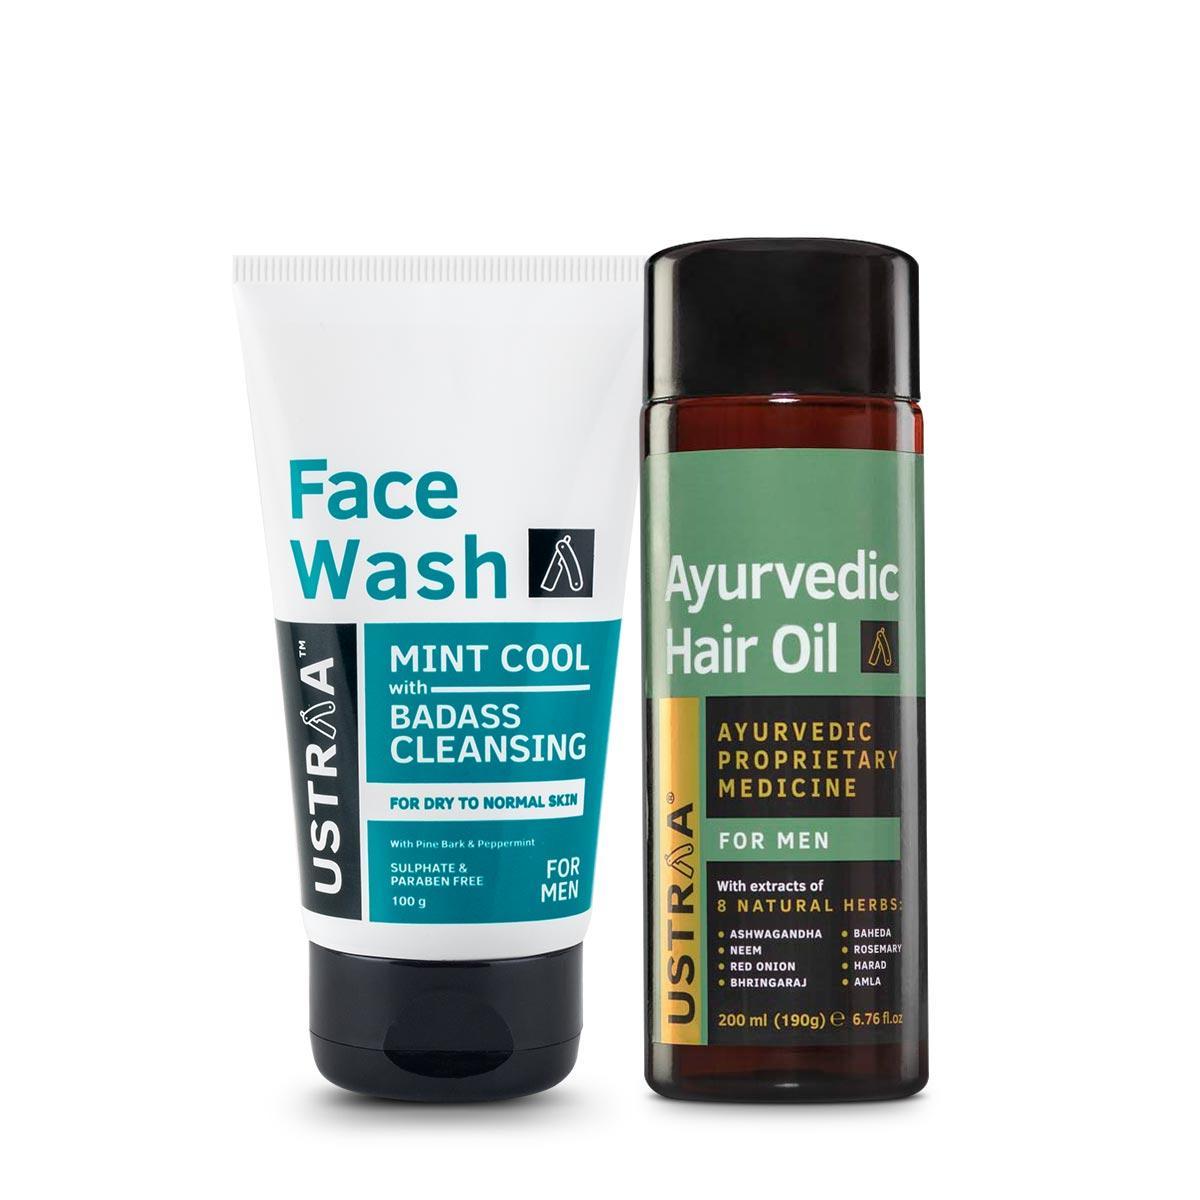 Ayurvedic Hair Oil & Face Wash - Dry Skin